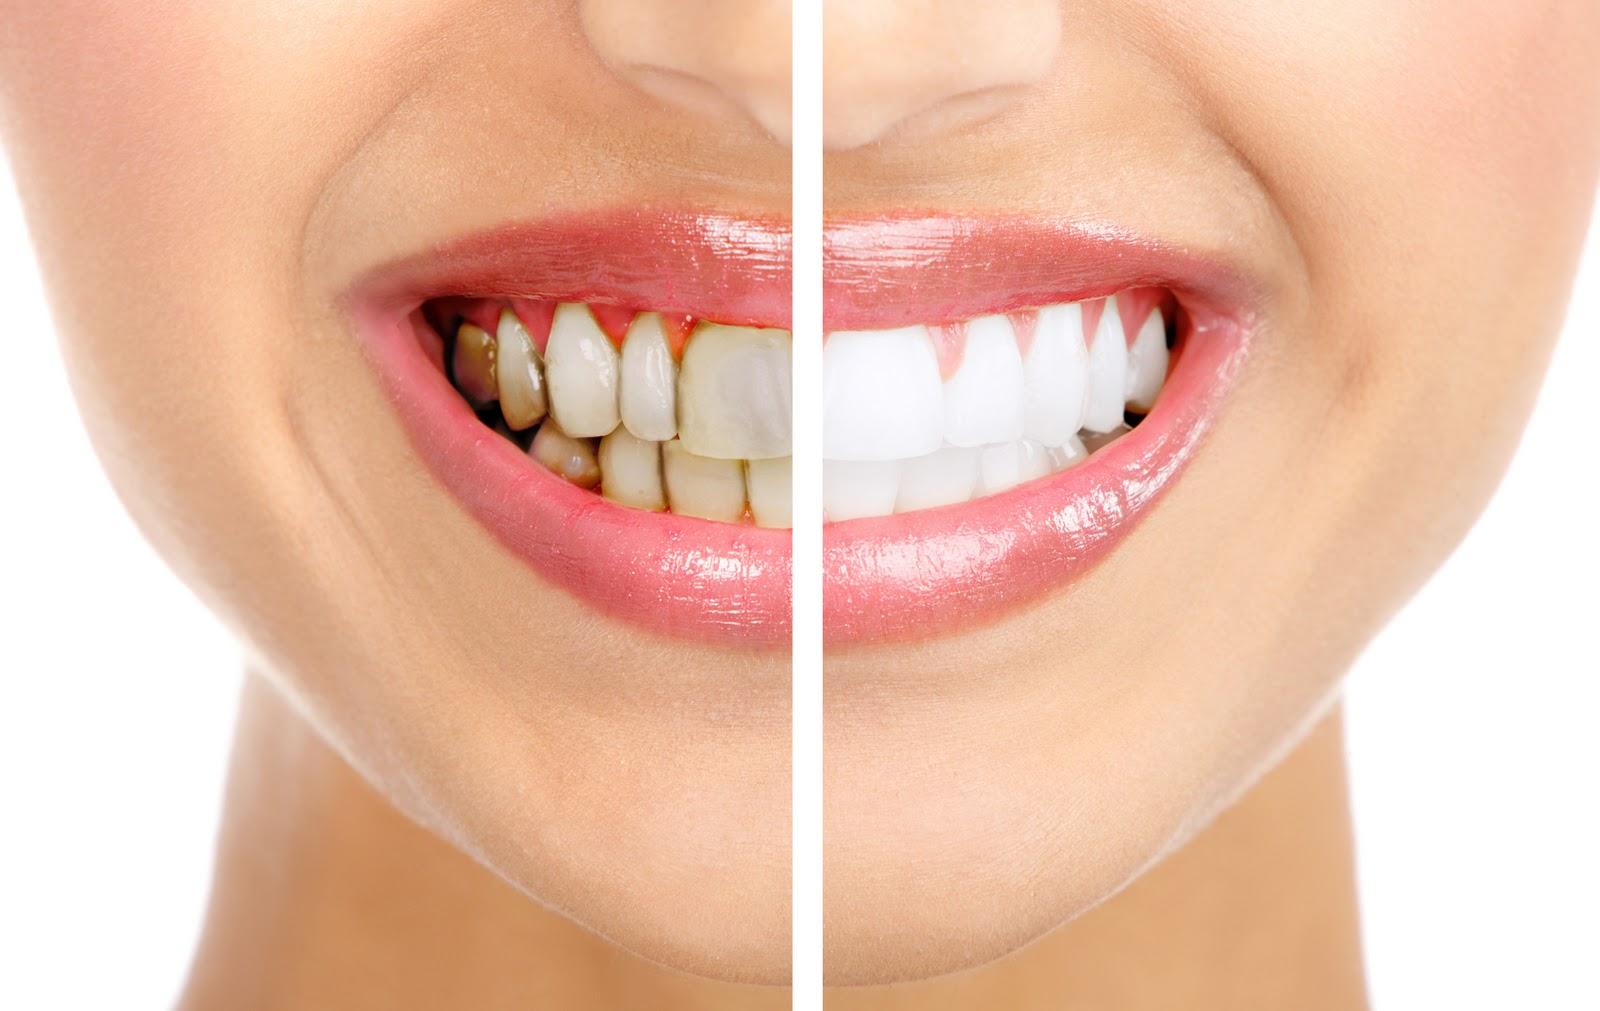 Izbjeljivanje zuba - Whitening i Bleaching proizvodi, Tanja Poropat, Labin, Istra